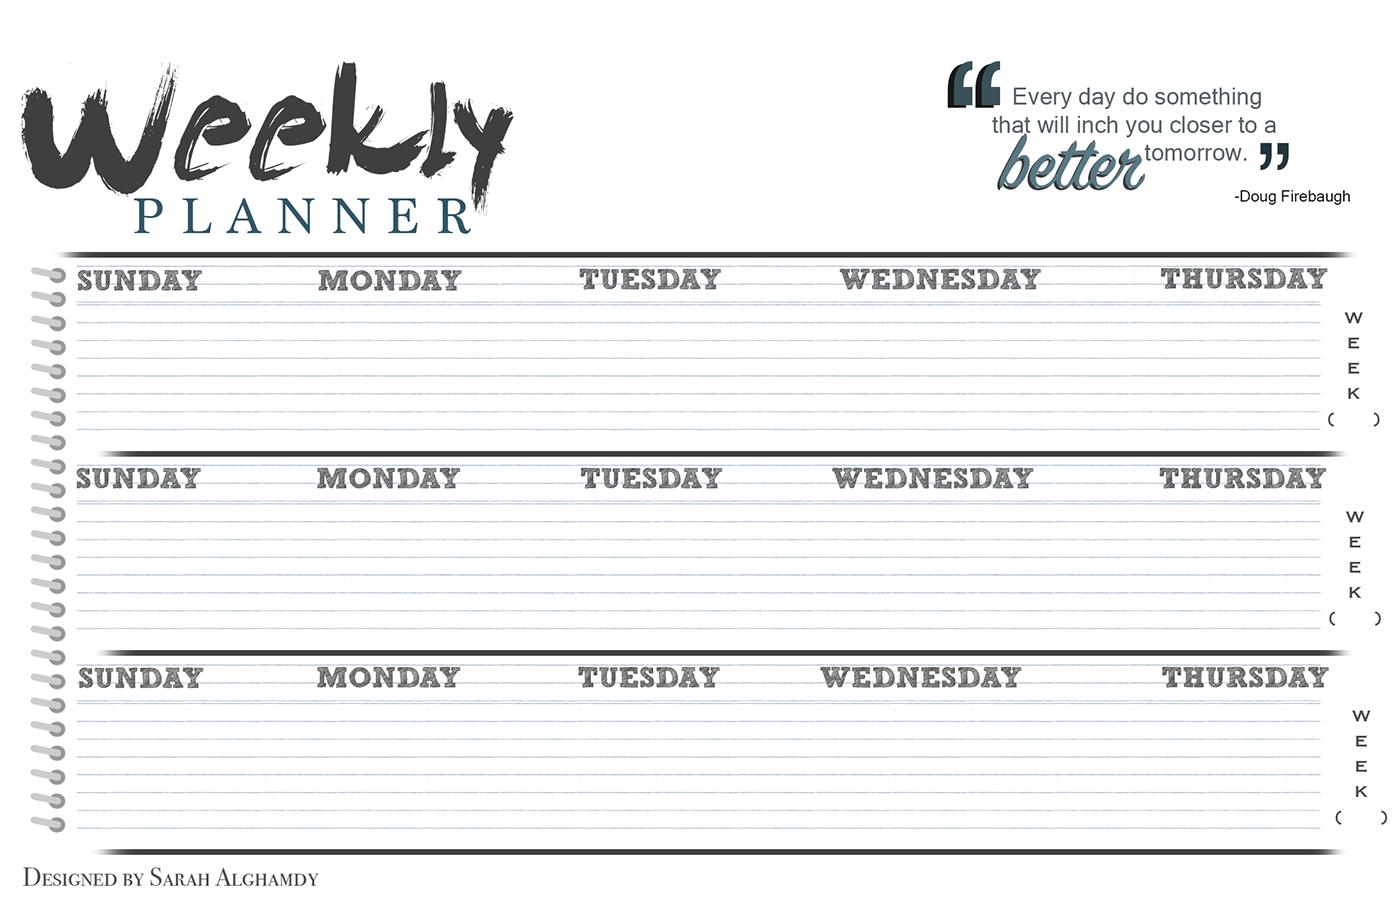 Weekly Planner Example